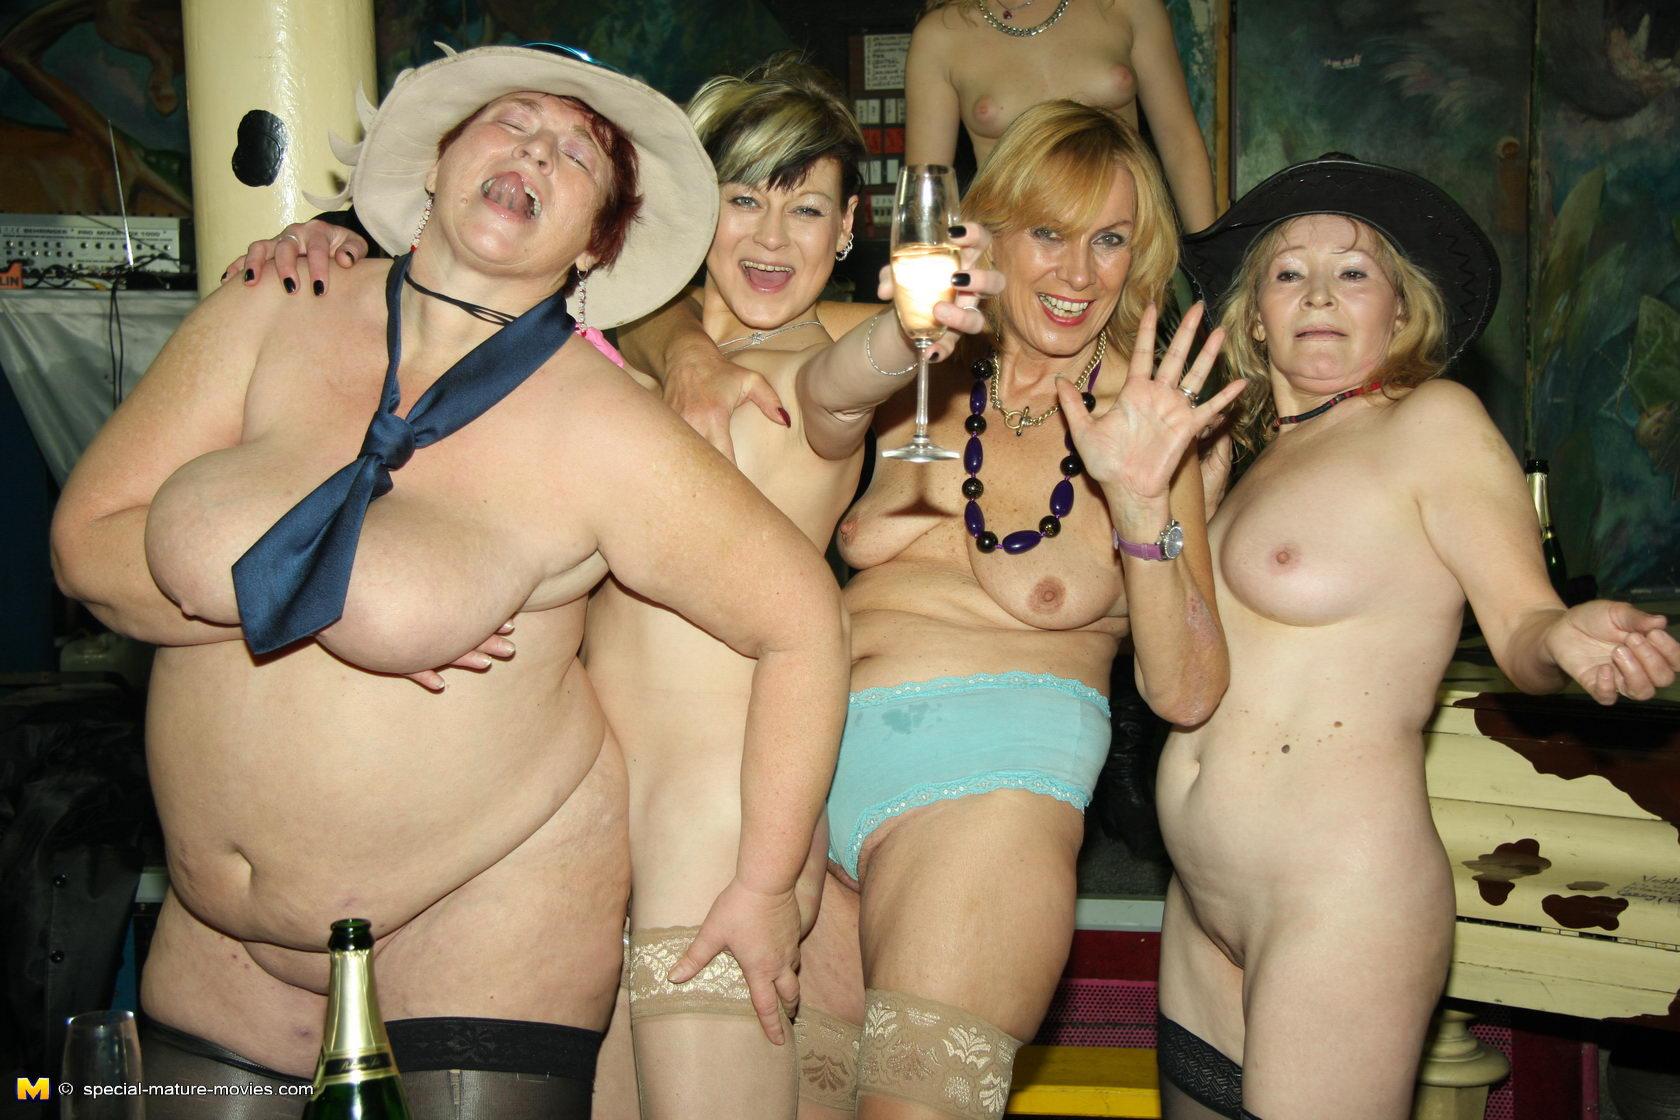 Wild gang sex good for